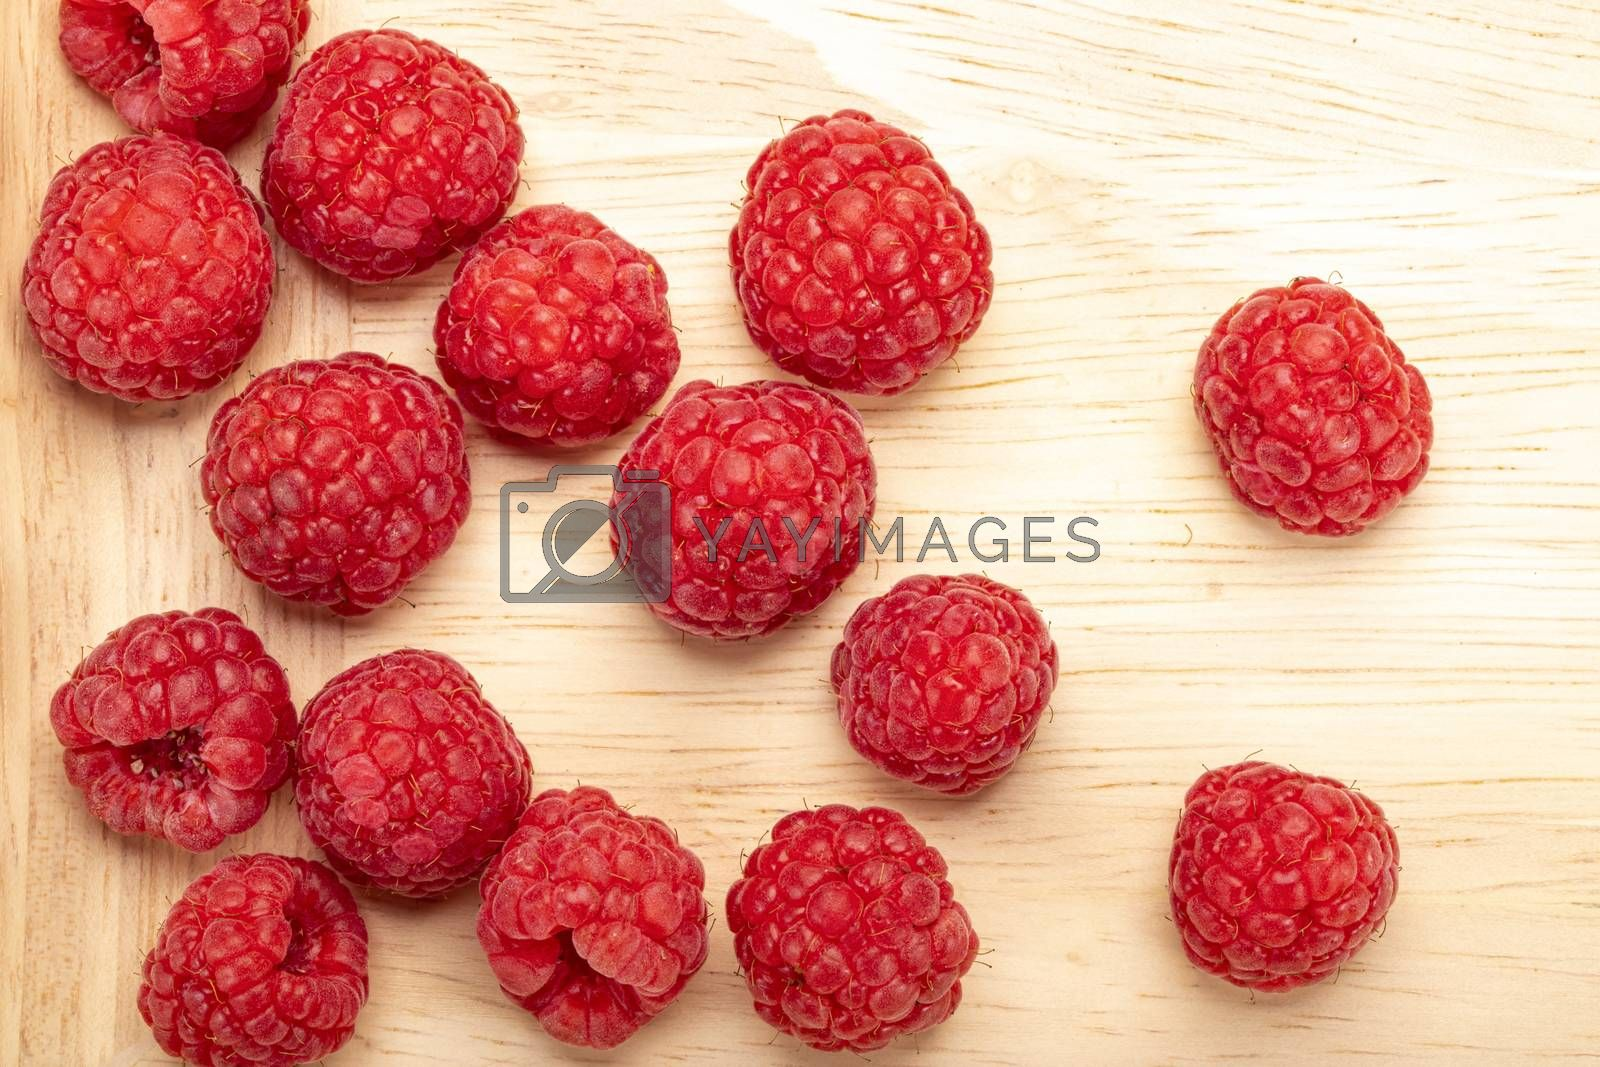 Fresh ripe raspberries on a wooden plate.